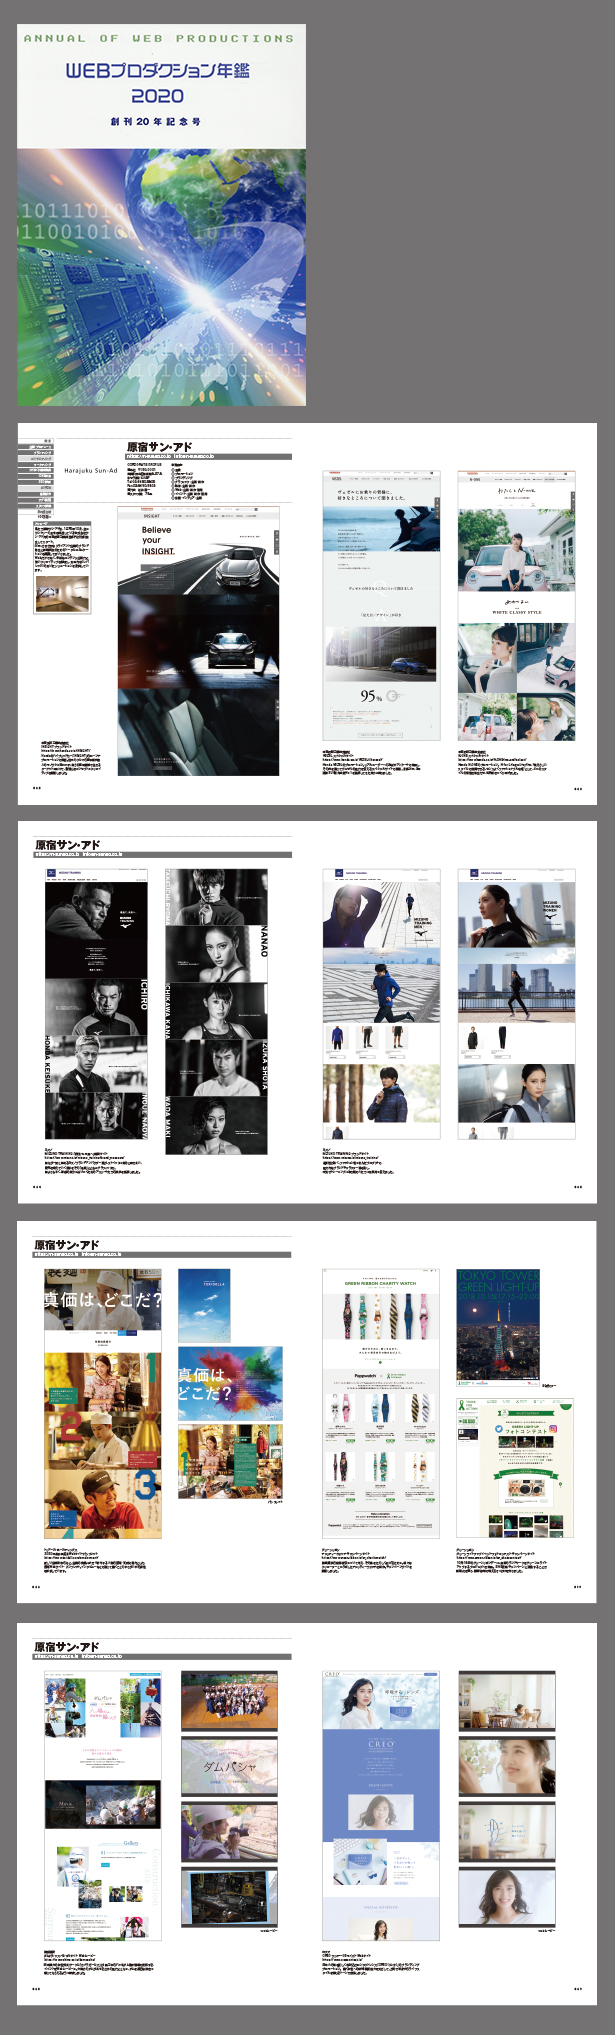 News_WebPro_20191030